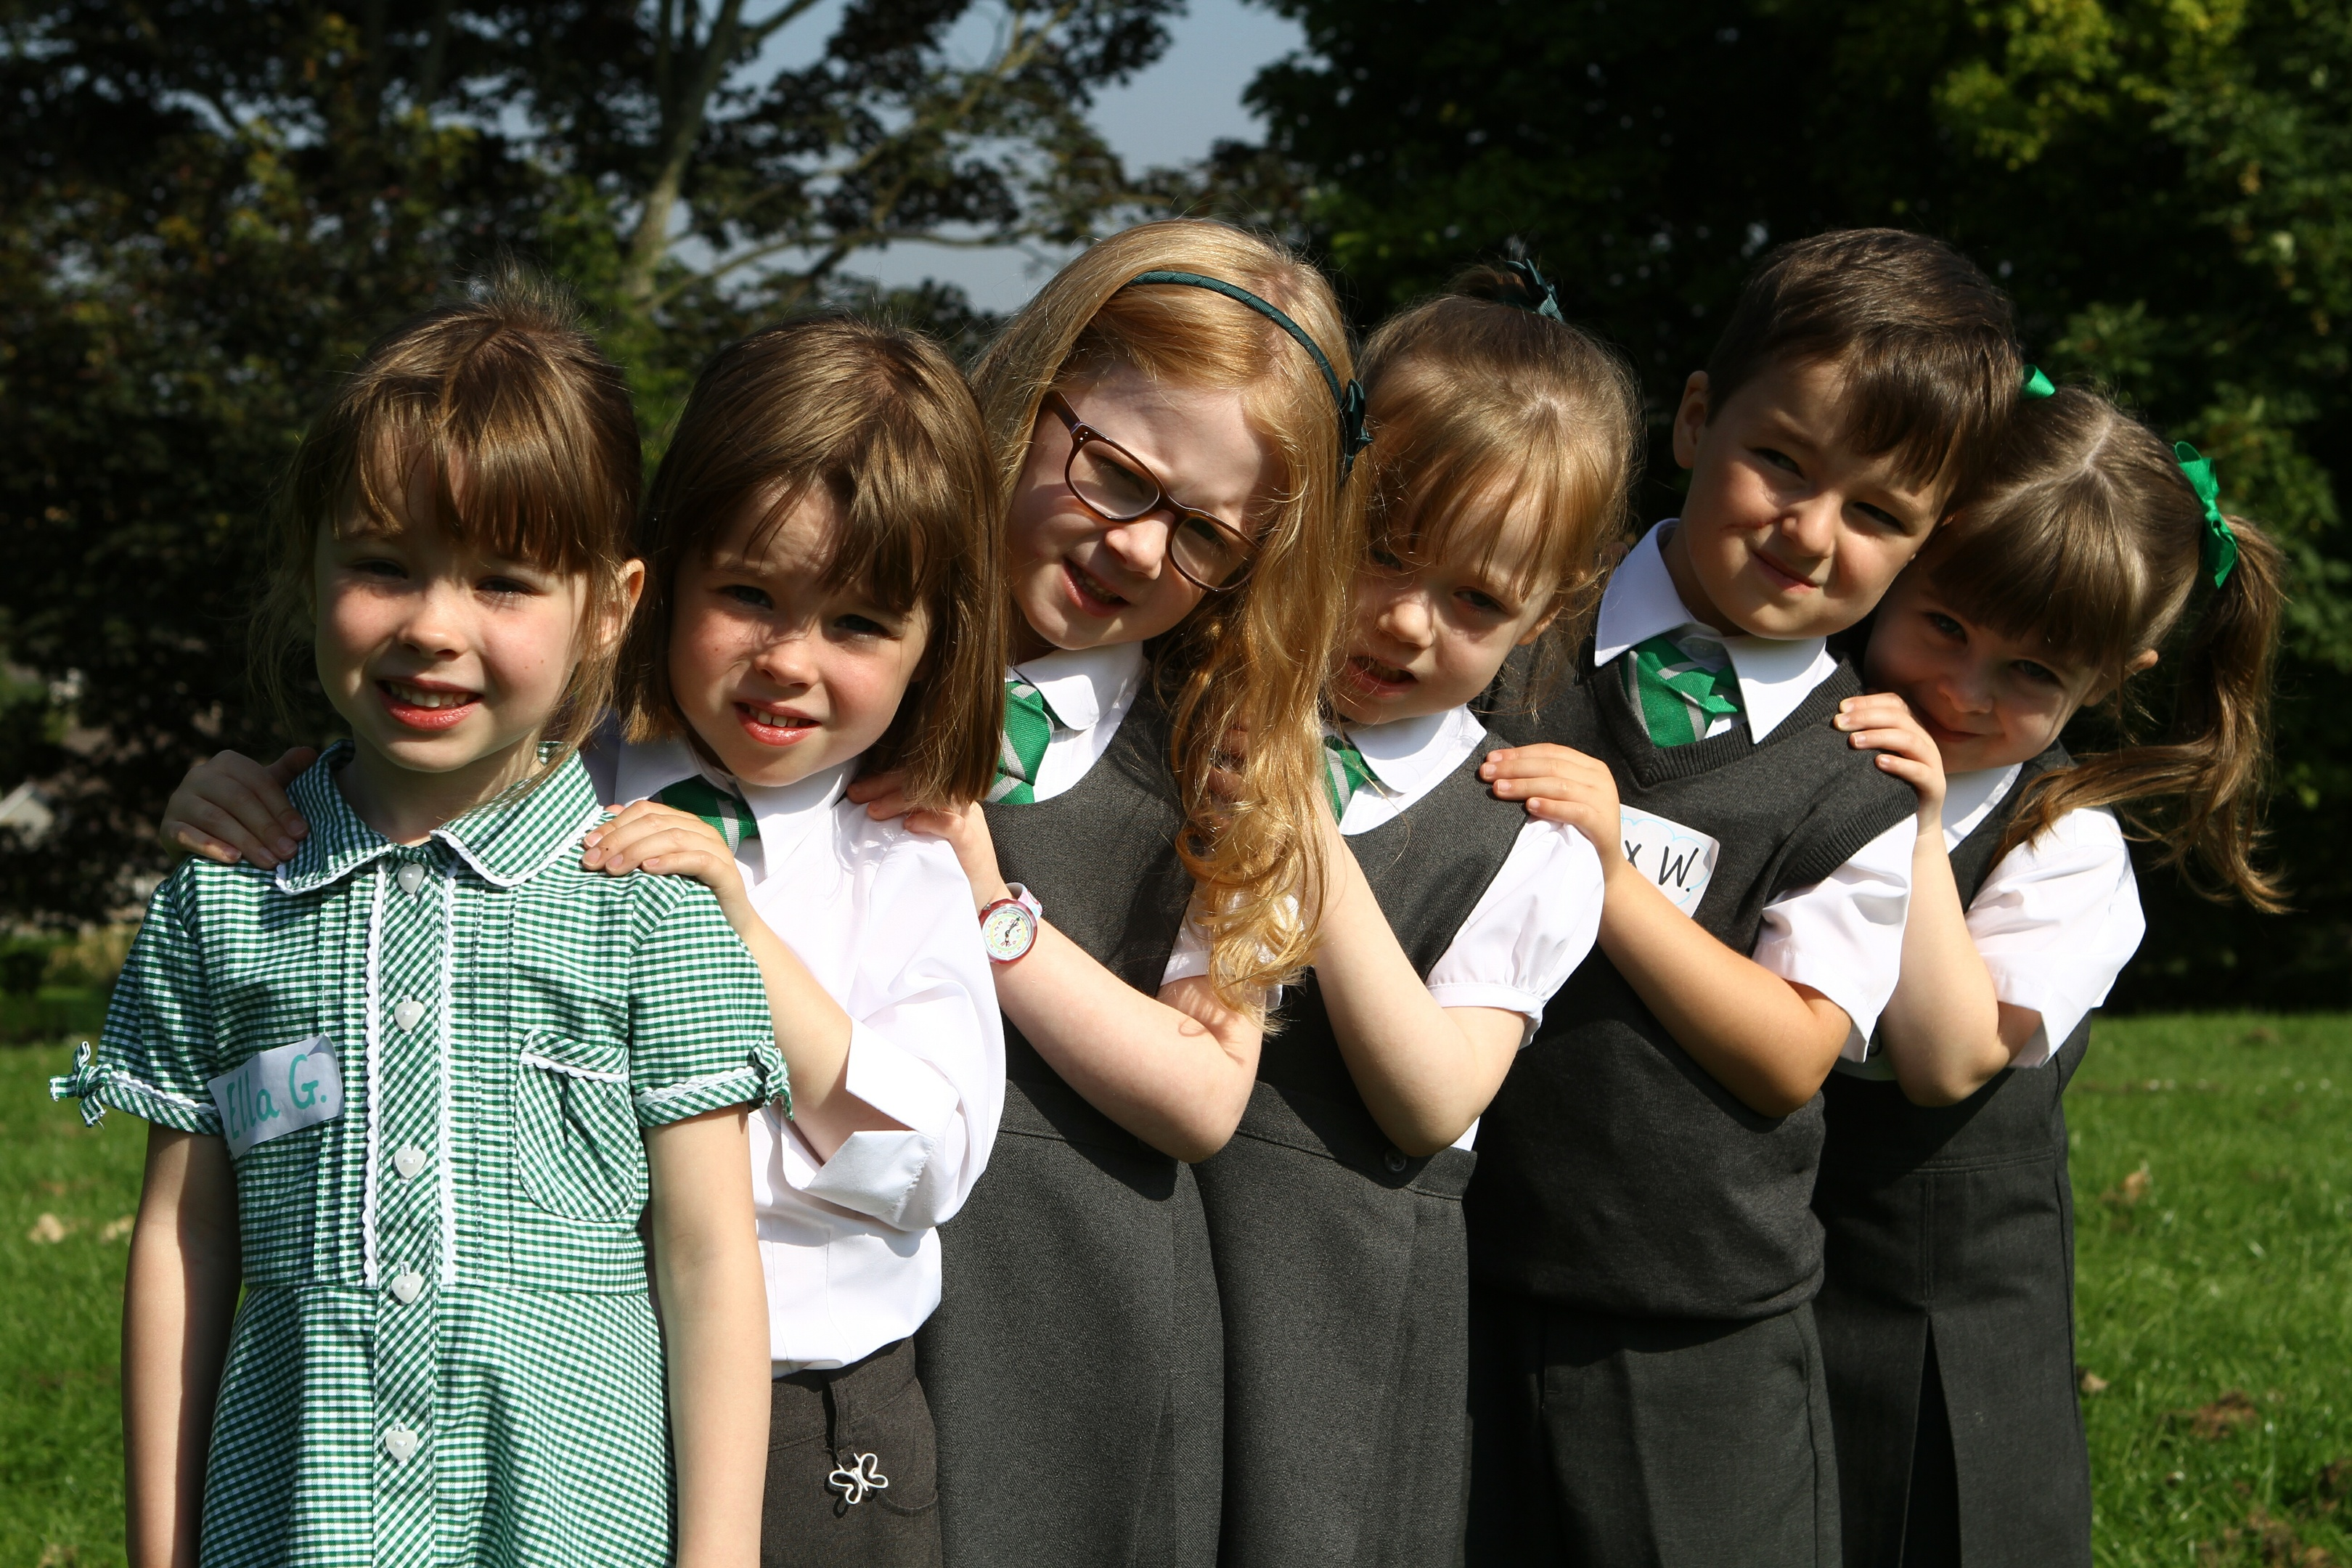 L-R: Ella & Mary Grimmond, Jessica & Pippa Donald, and Max & Lola Wood.